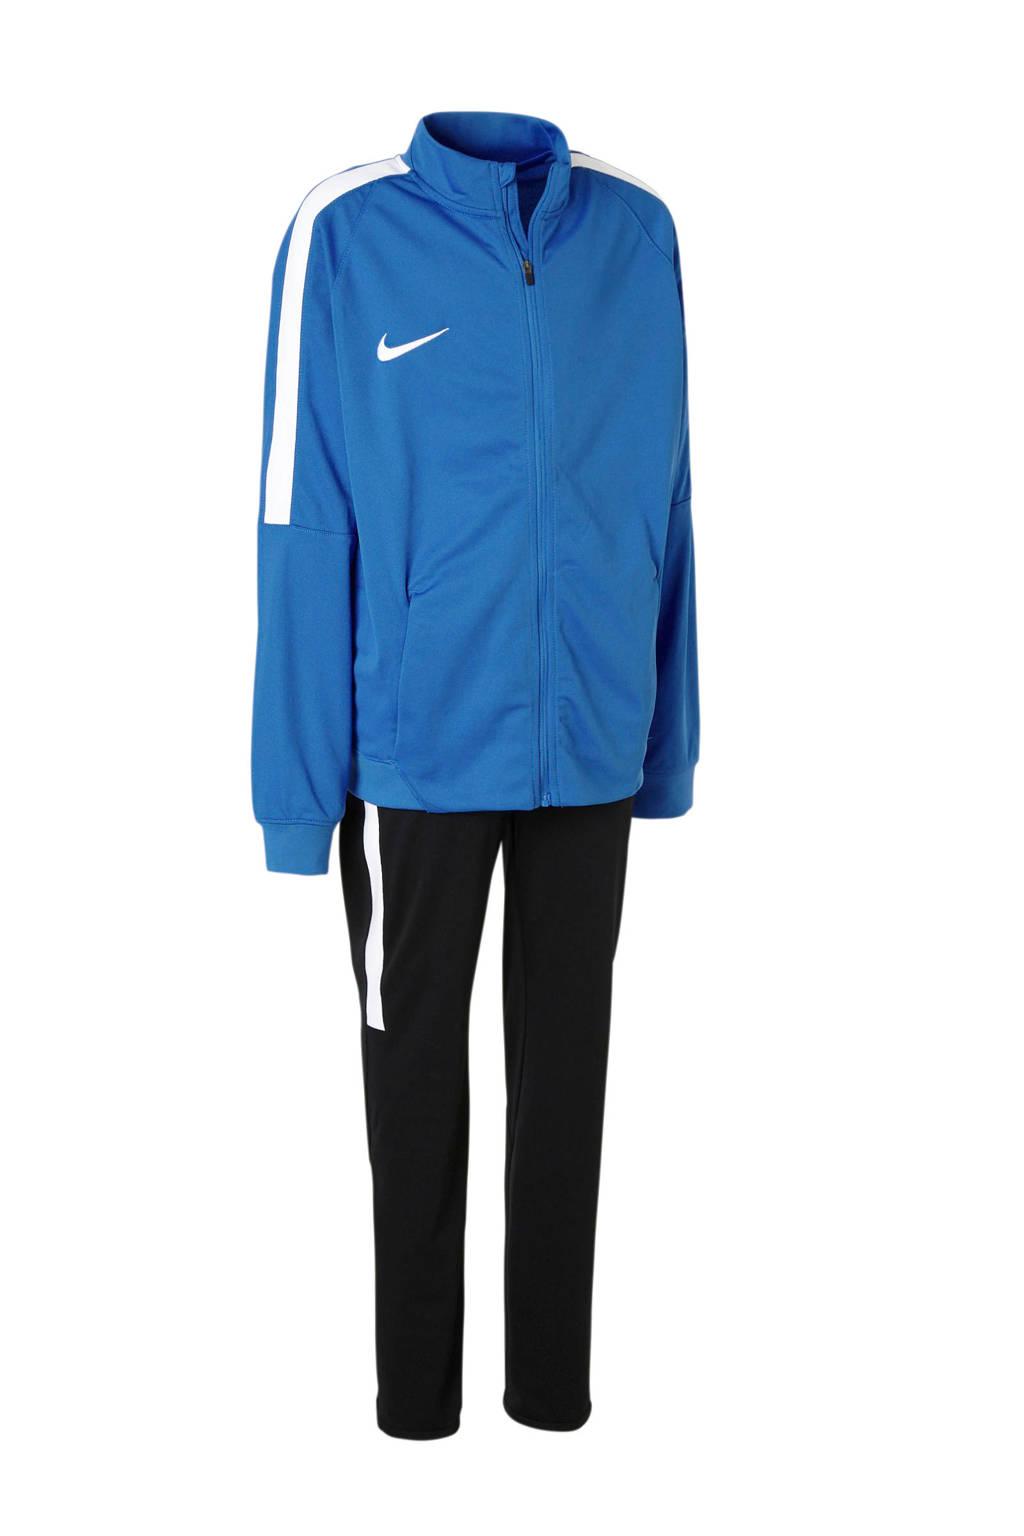 Nike   trainingspak blauw, Blauw/wit/zwart